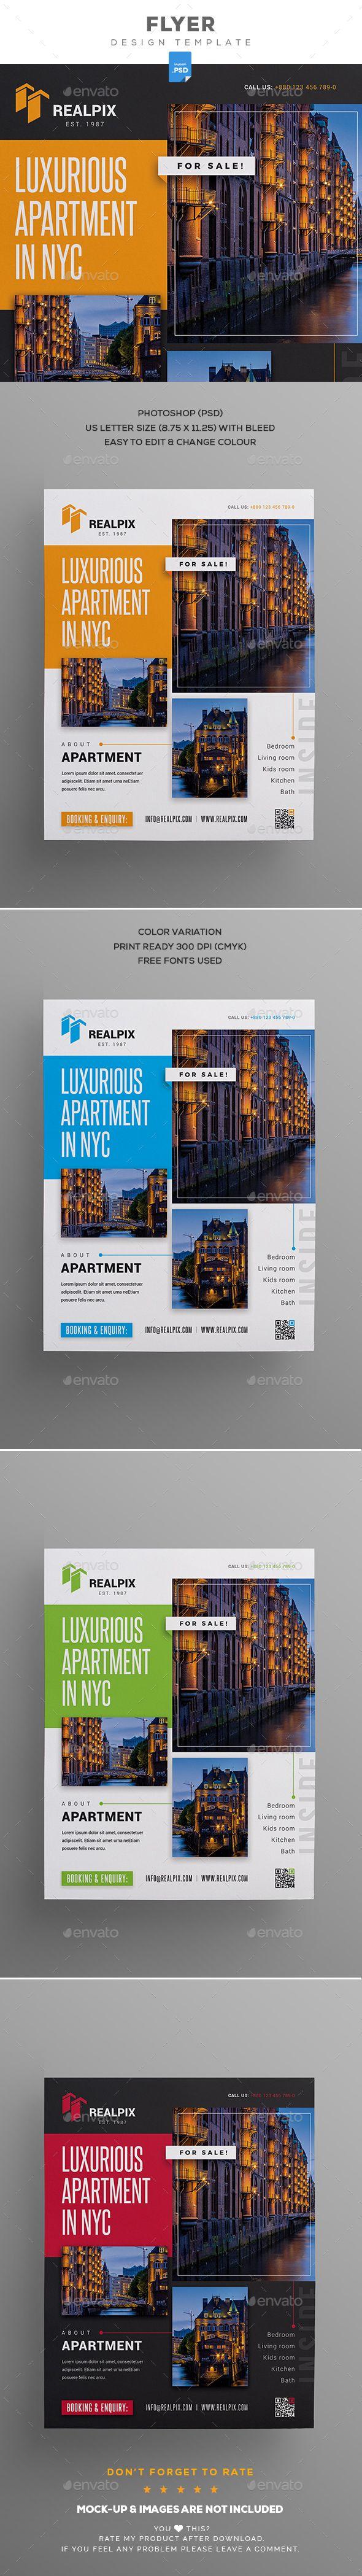 Real Estate #Flyer - Commerce Flyers Download Here:   https://graphicriver.net/item/real-estate-flyer/20120955?ref=suz_562geid